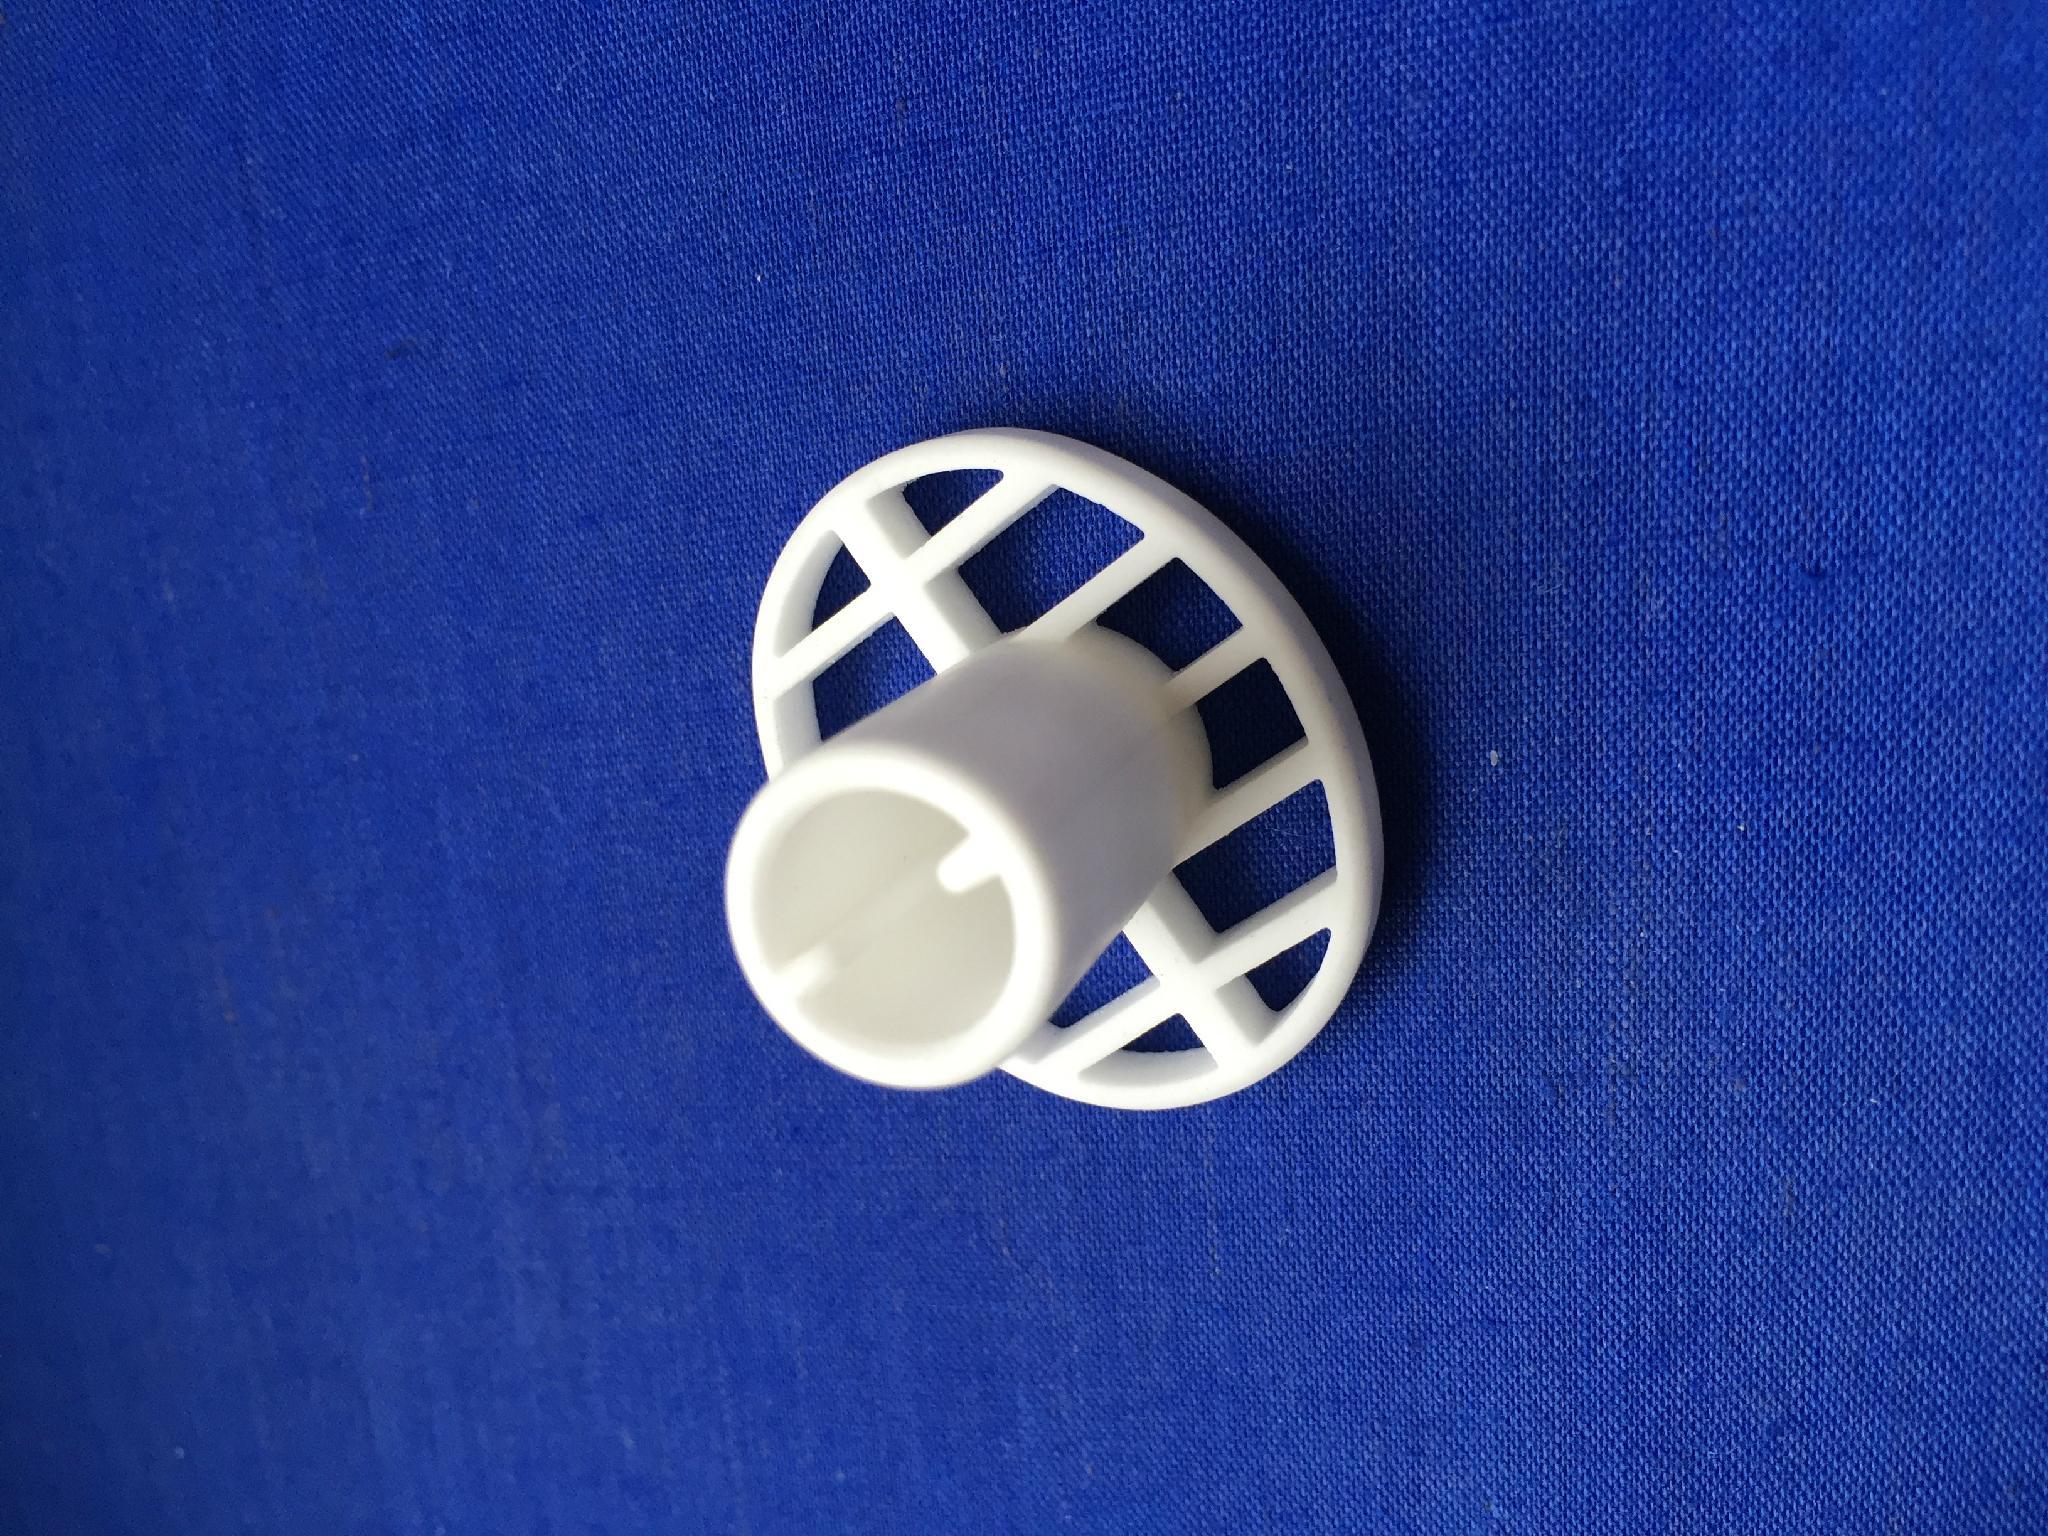 96 aluminum oxide wear-resisting ceramics fittings 3